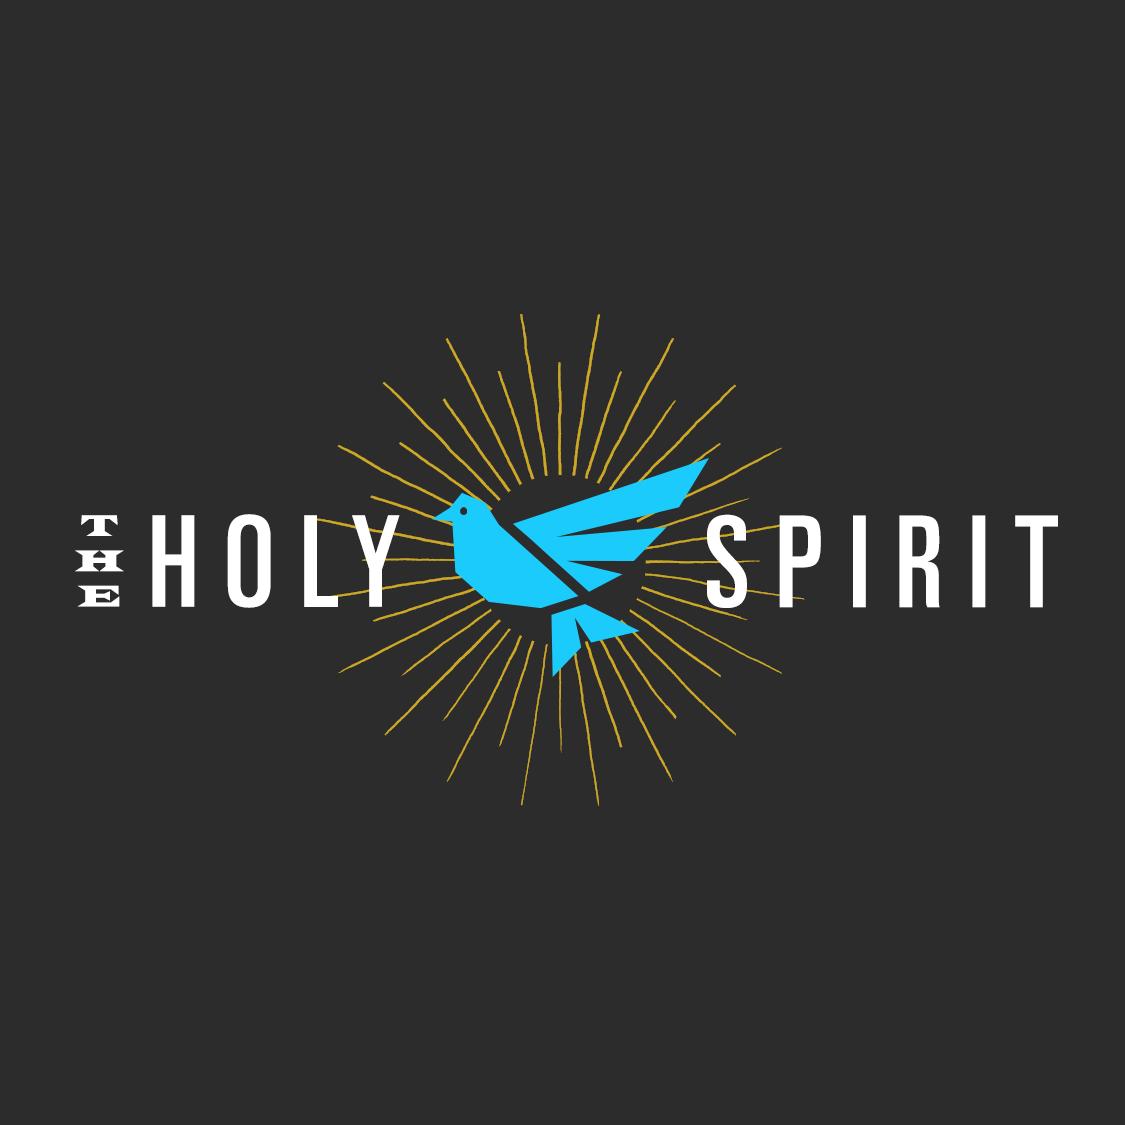 Sermon_HolySpirit_square.jpg